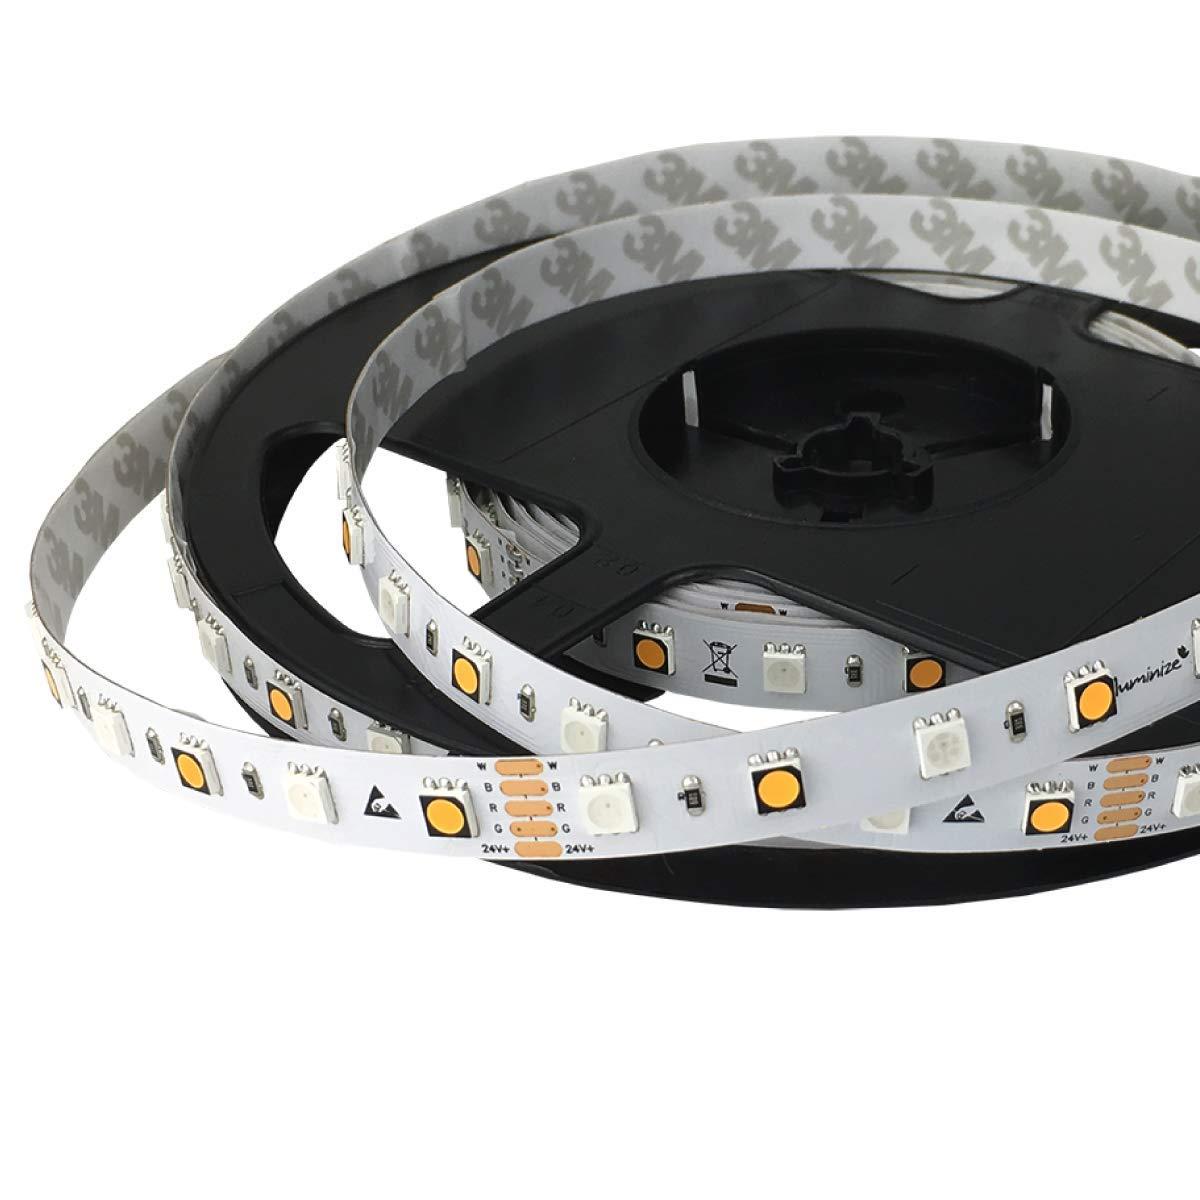 Iluminize LED-Streifen LED-Streifen LED-Streifen RGB+W  sehr hochwertiger LED-Streifen RGB+W (2700K Ra 95) mit 60 LEDs pro Meter, hoch selektiert, 24V, 16,5W pro Meter (IP65 NANO Rolle 5m) d171df